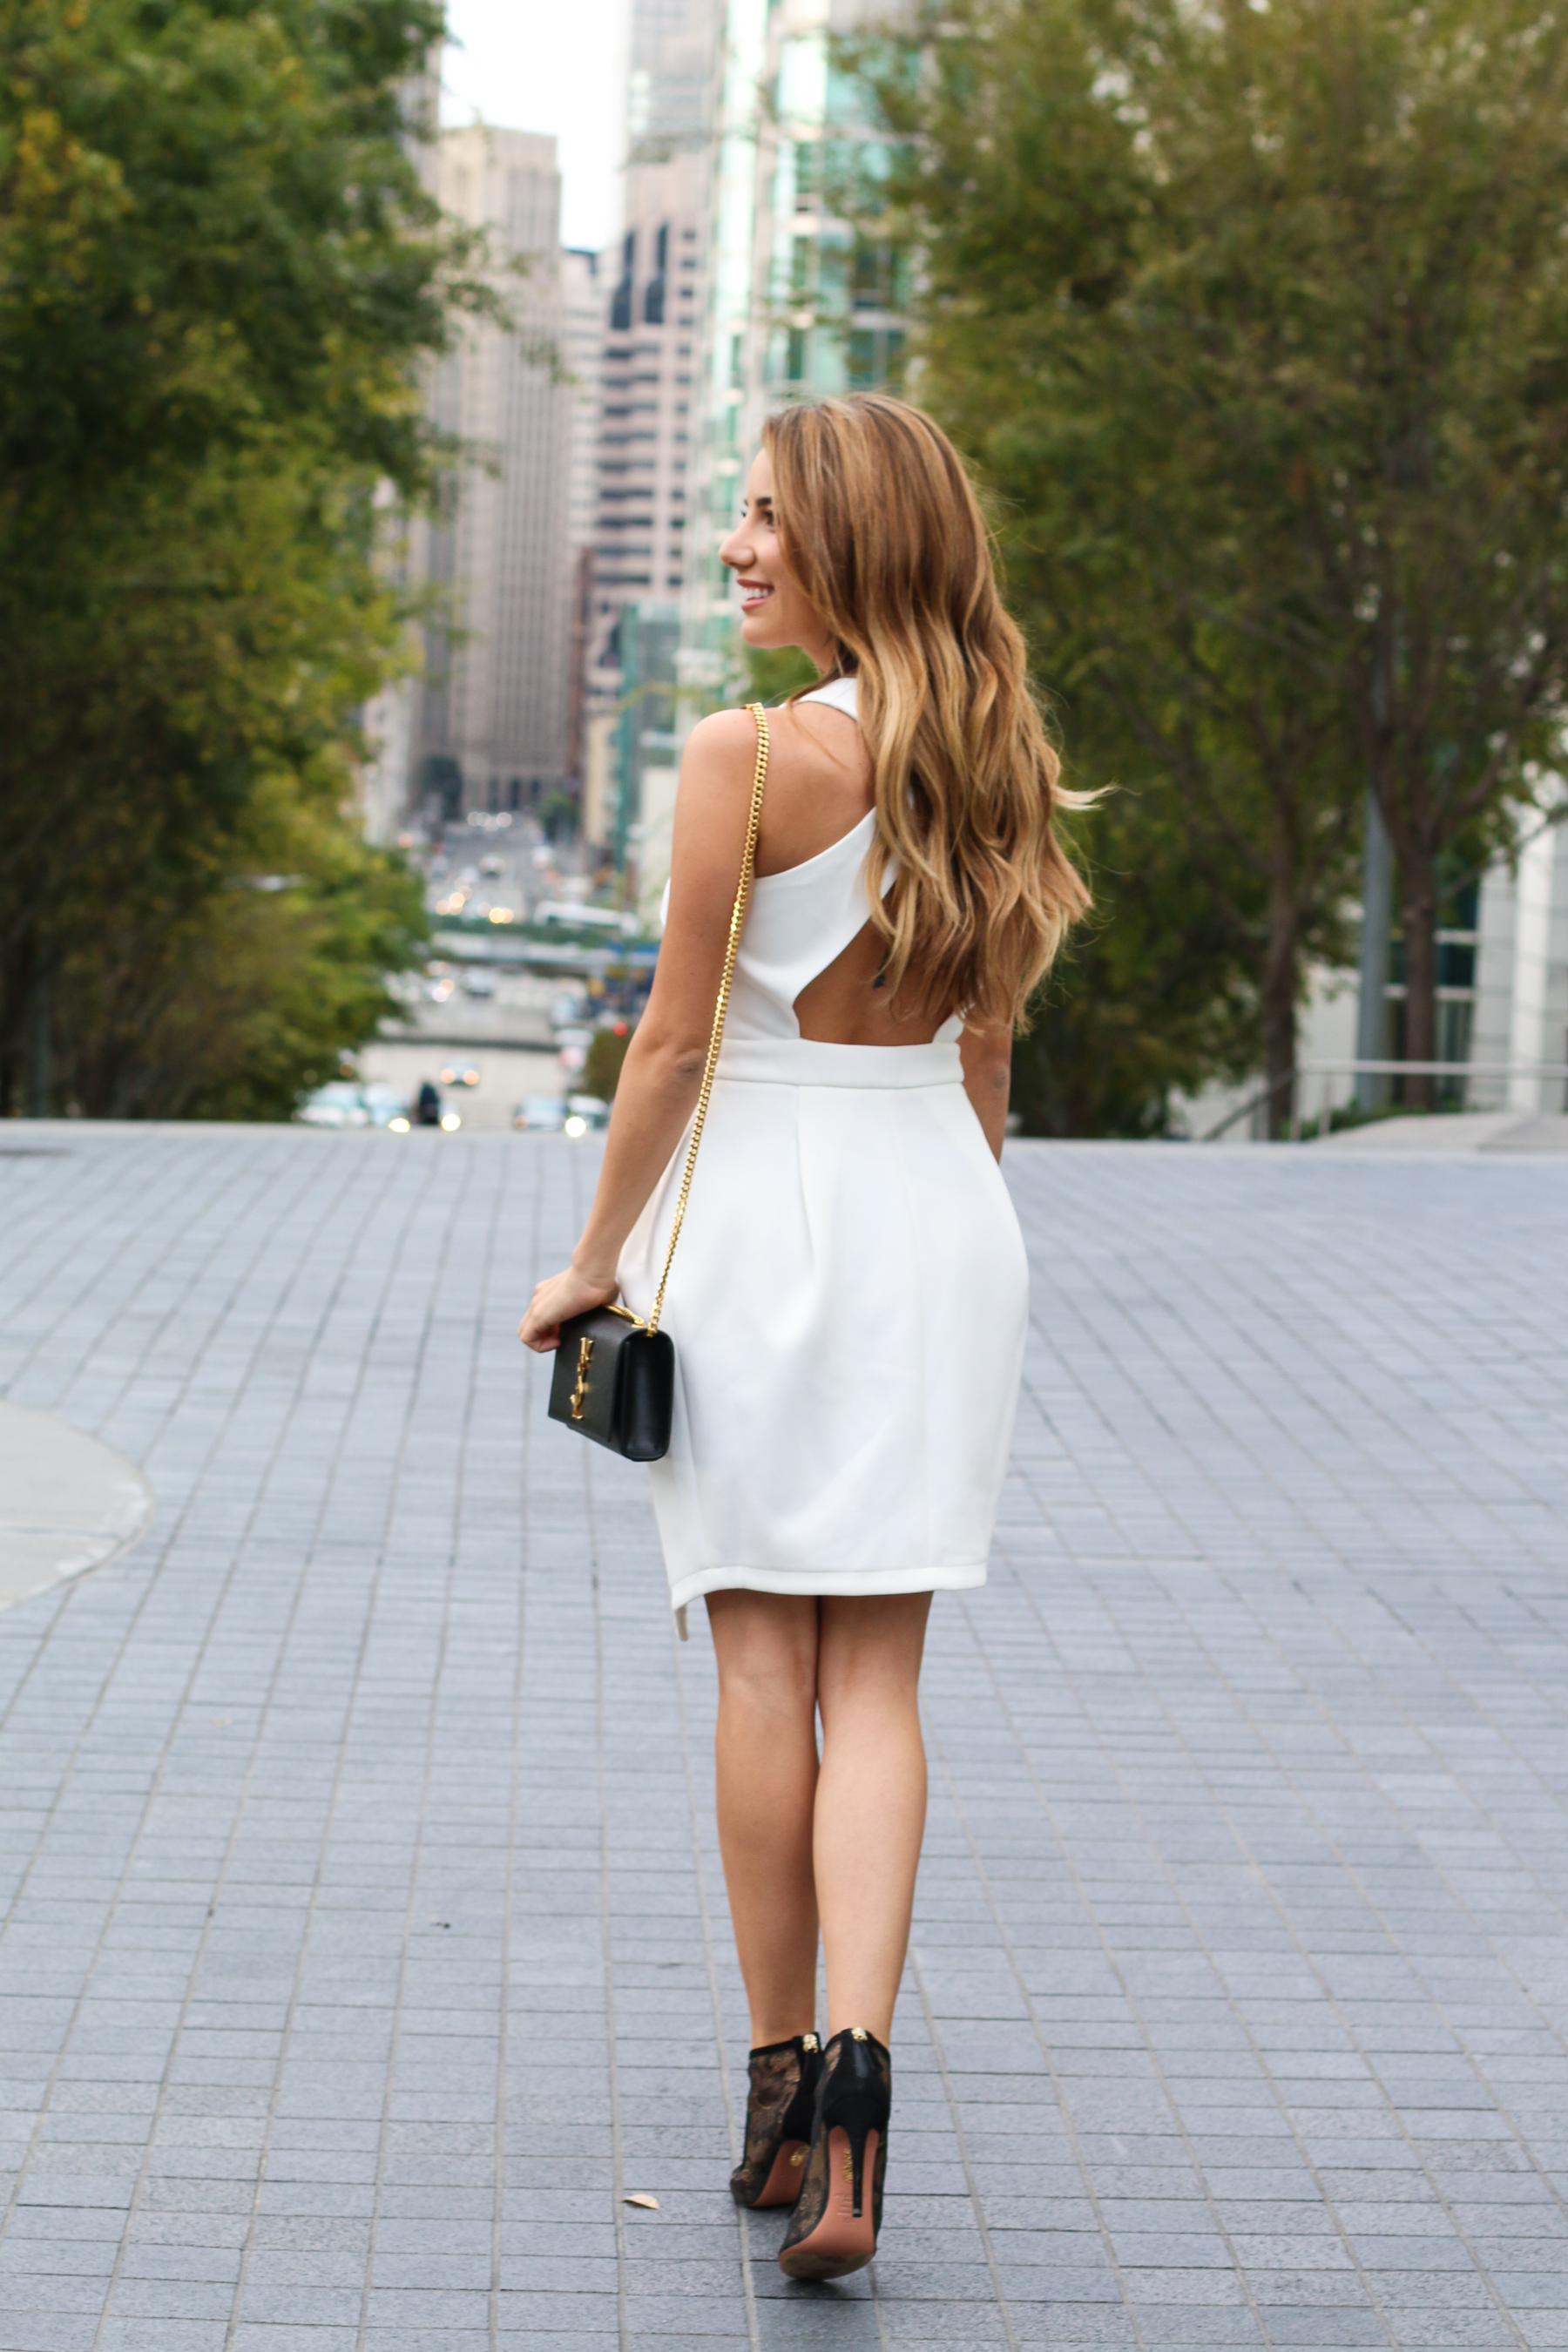 Ariana Lauren Fashion Born Blogger Streetstyle Photography by Ryan Chua-1063